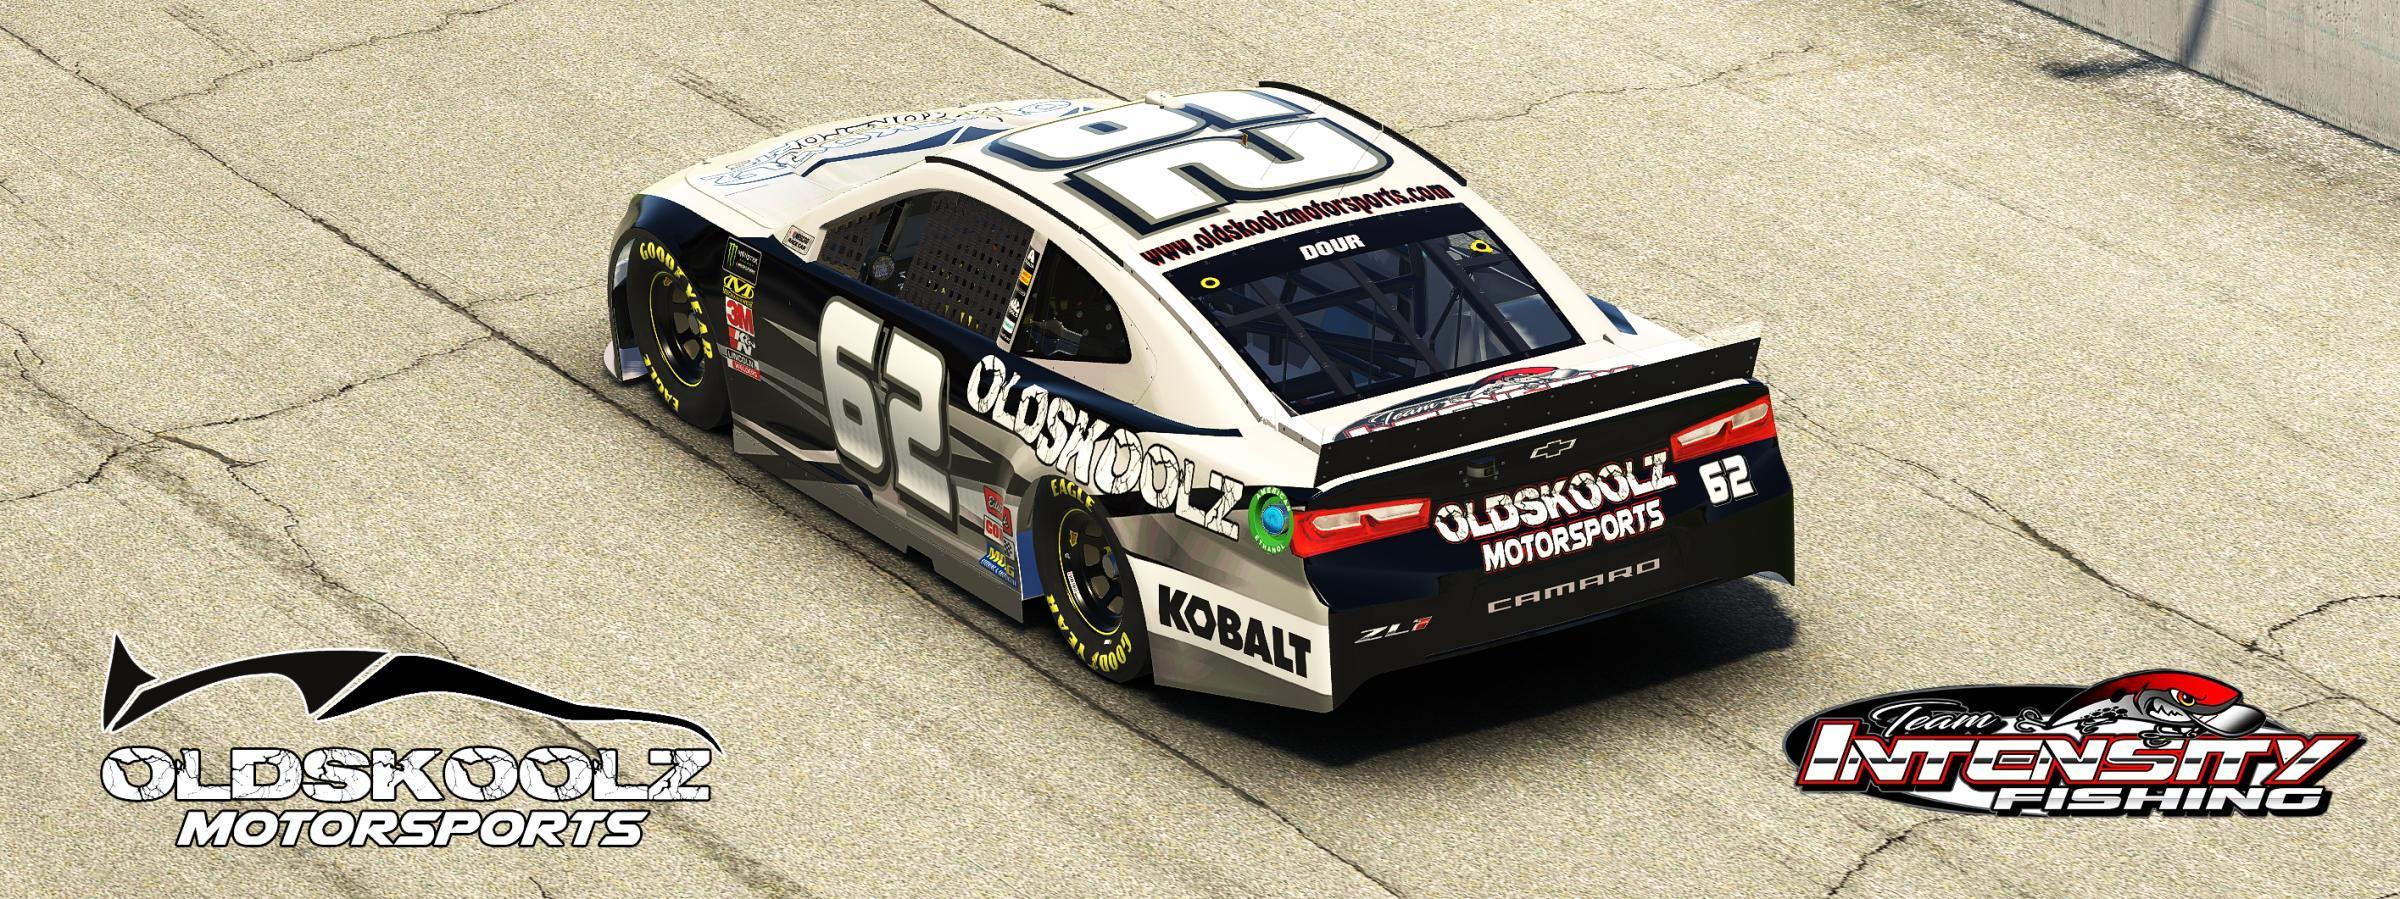 Preview of OldSkoolz Motorsports ZL1 by Sean D.